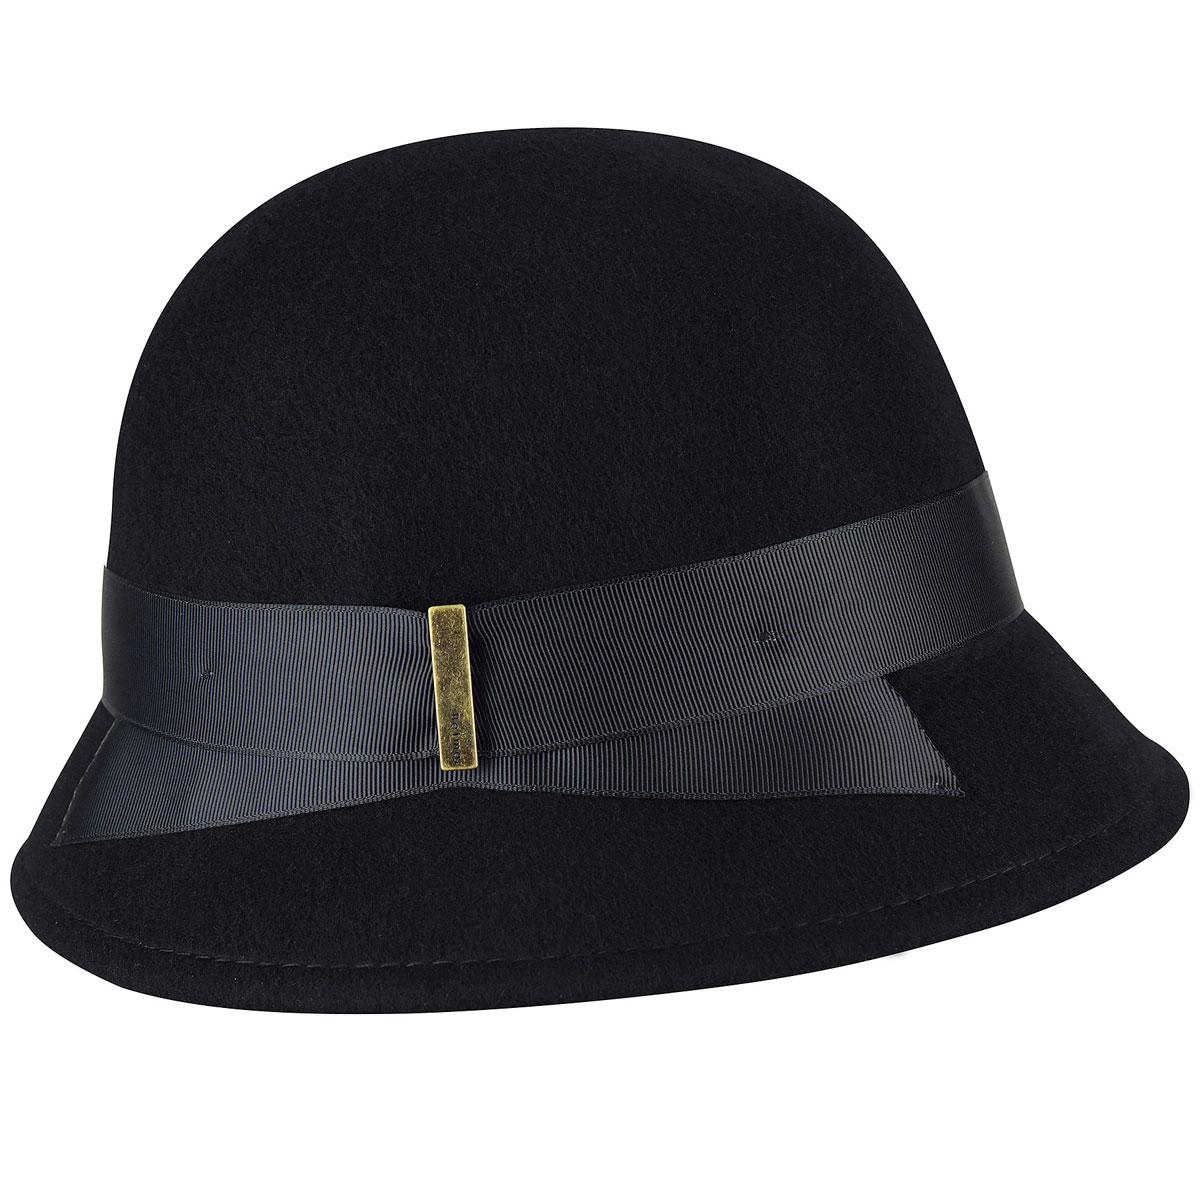 1960s – 70s Hats, Wigs, Gloves, Scarf Alcott Cloche $59.00 AT vintagedancer.com